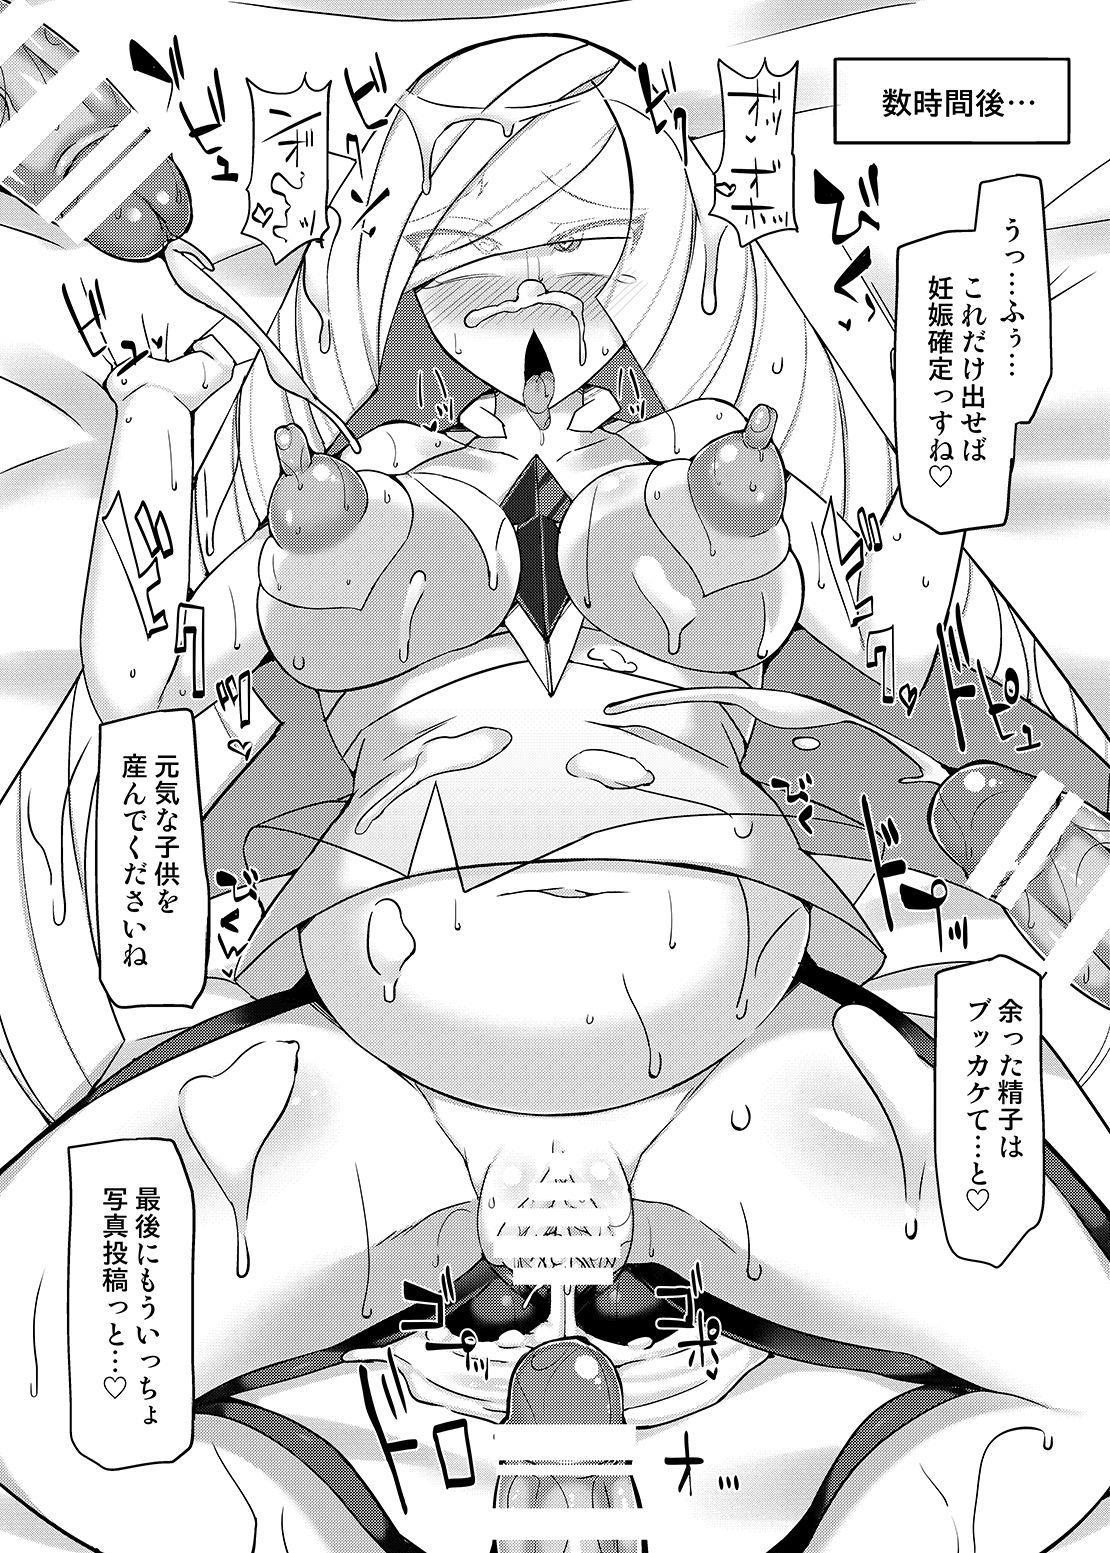 [Stapspats (Hisui)] Stapspats [Pocket Monster Saimin Series Soushuuhen] 1 Collective Hypnosis (Pokémon) [Digital] 74